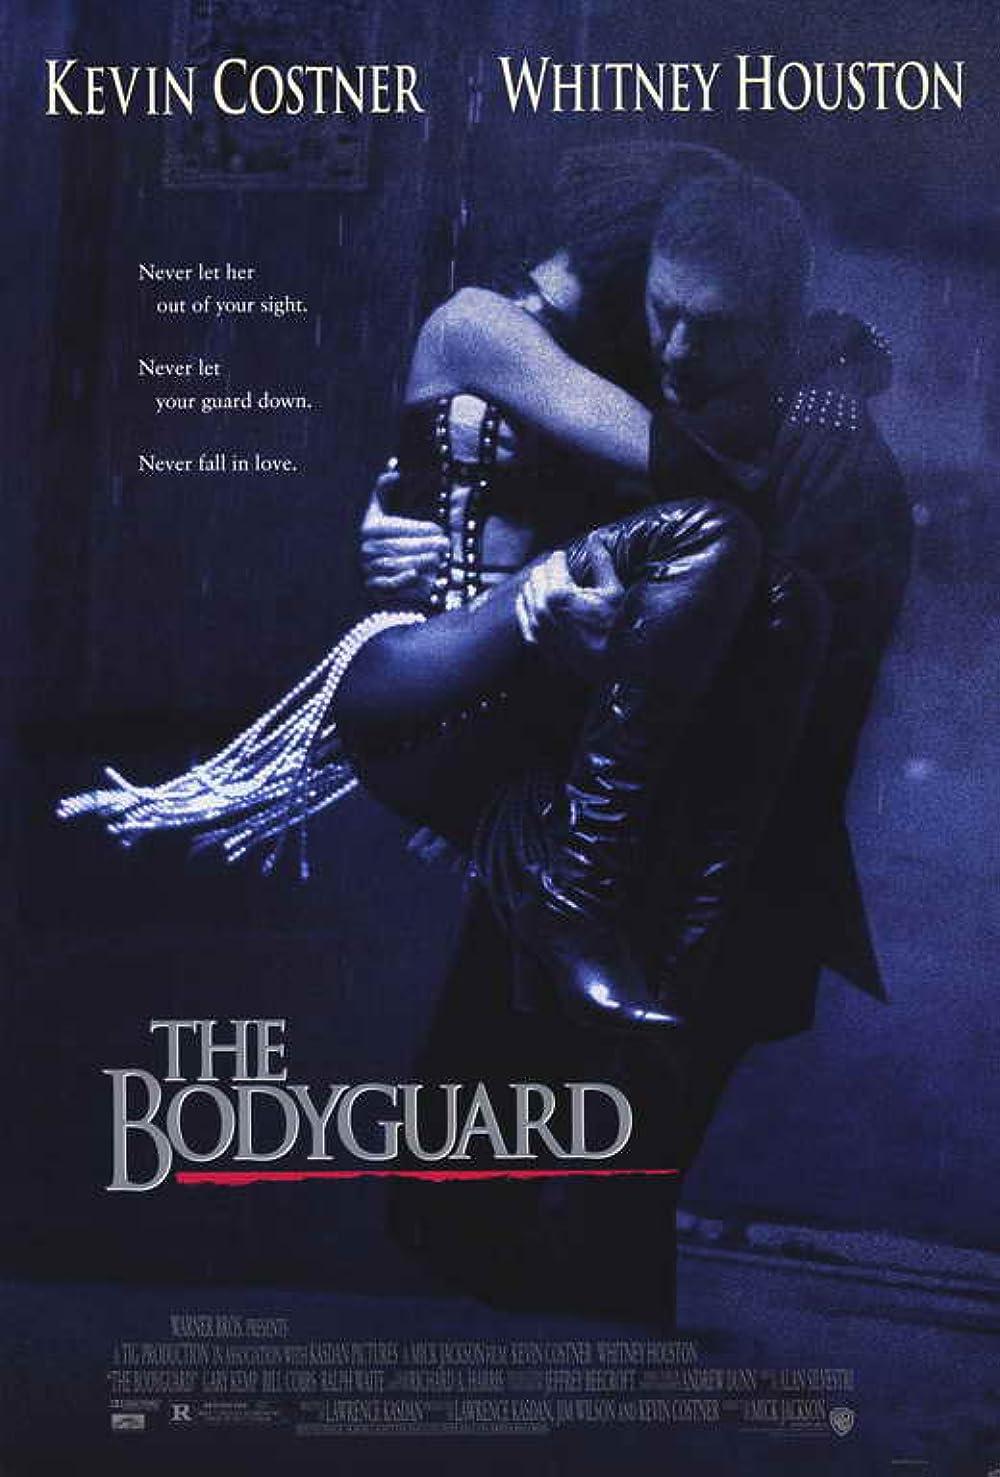 Filmbeschreibung zu Bodyguard